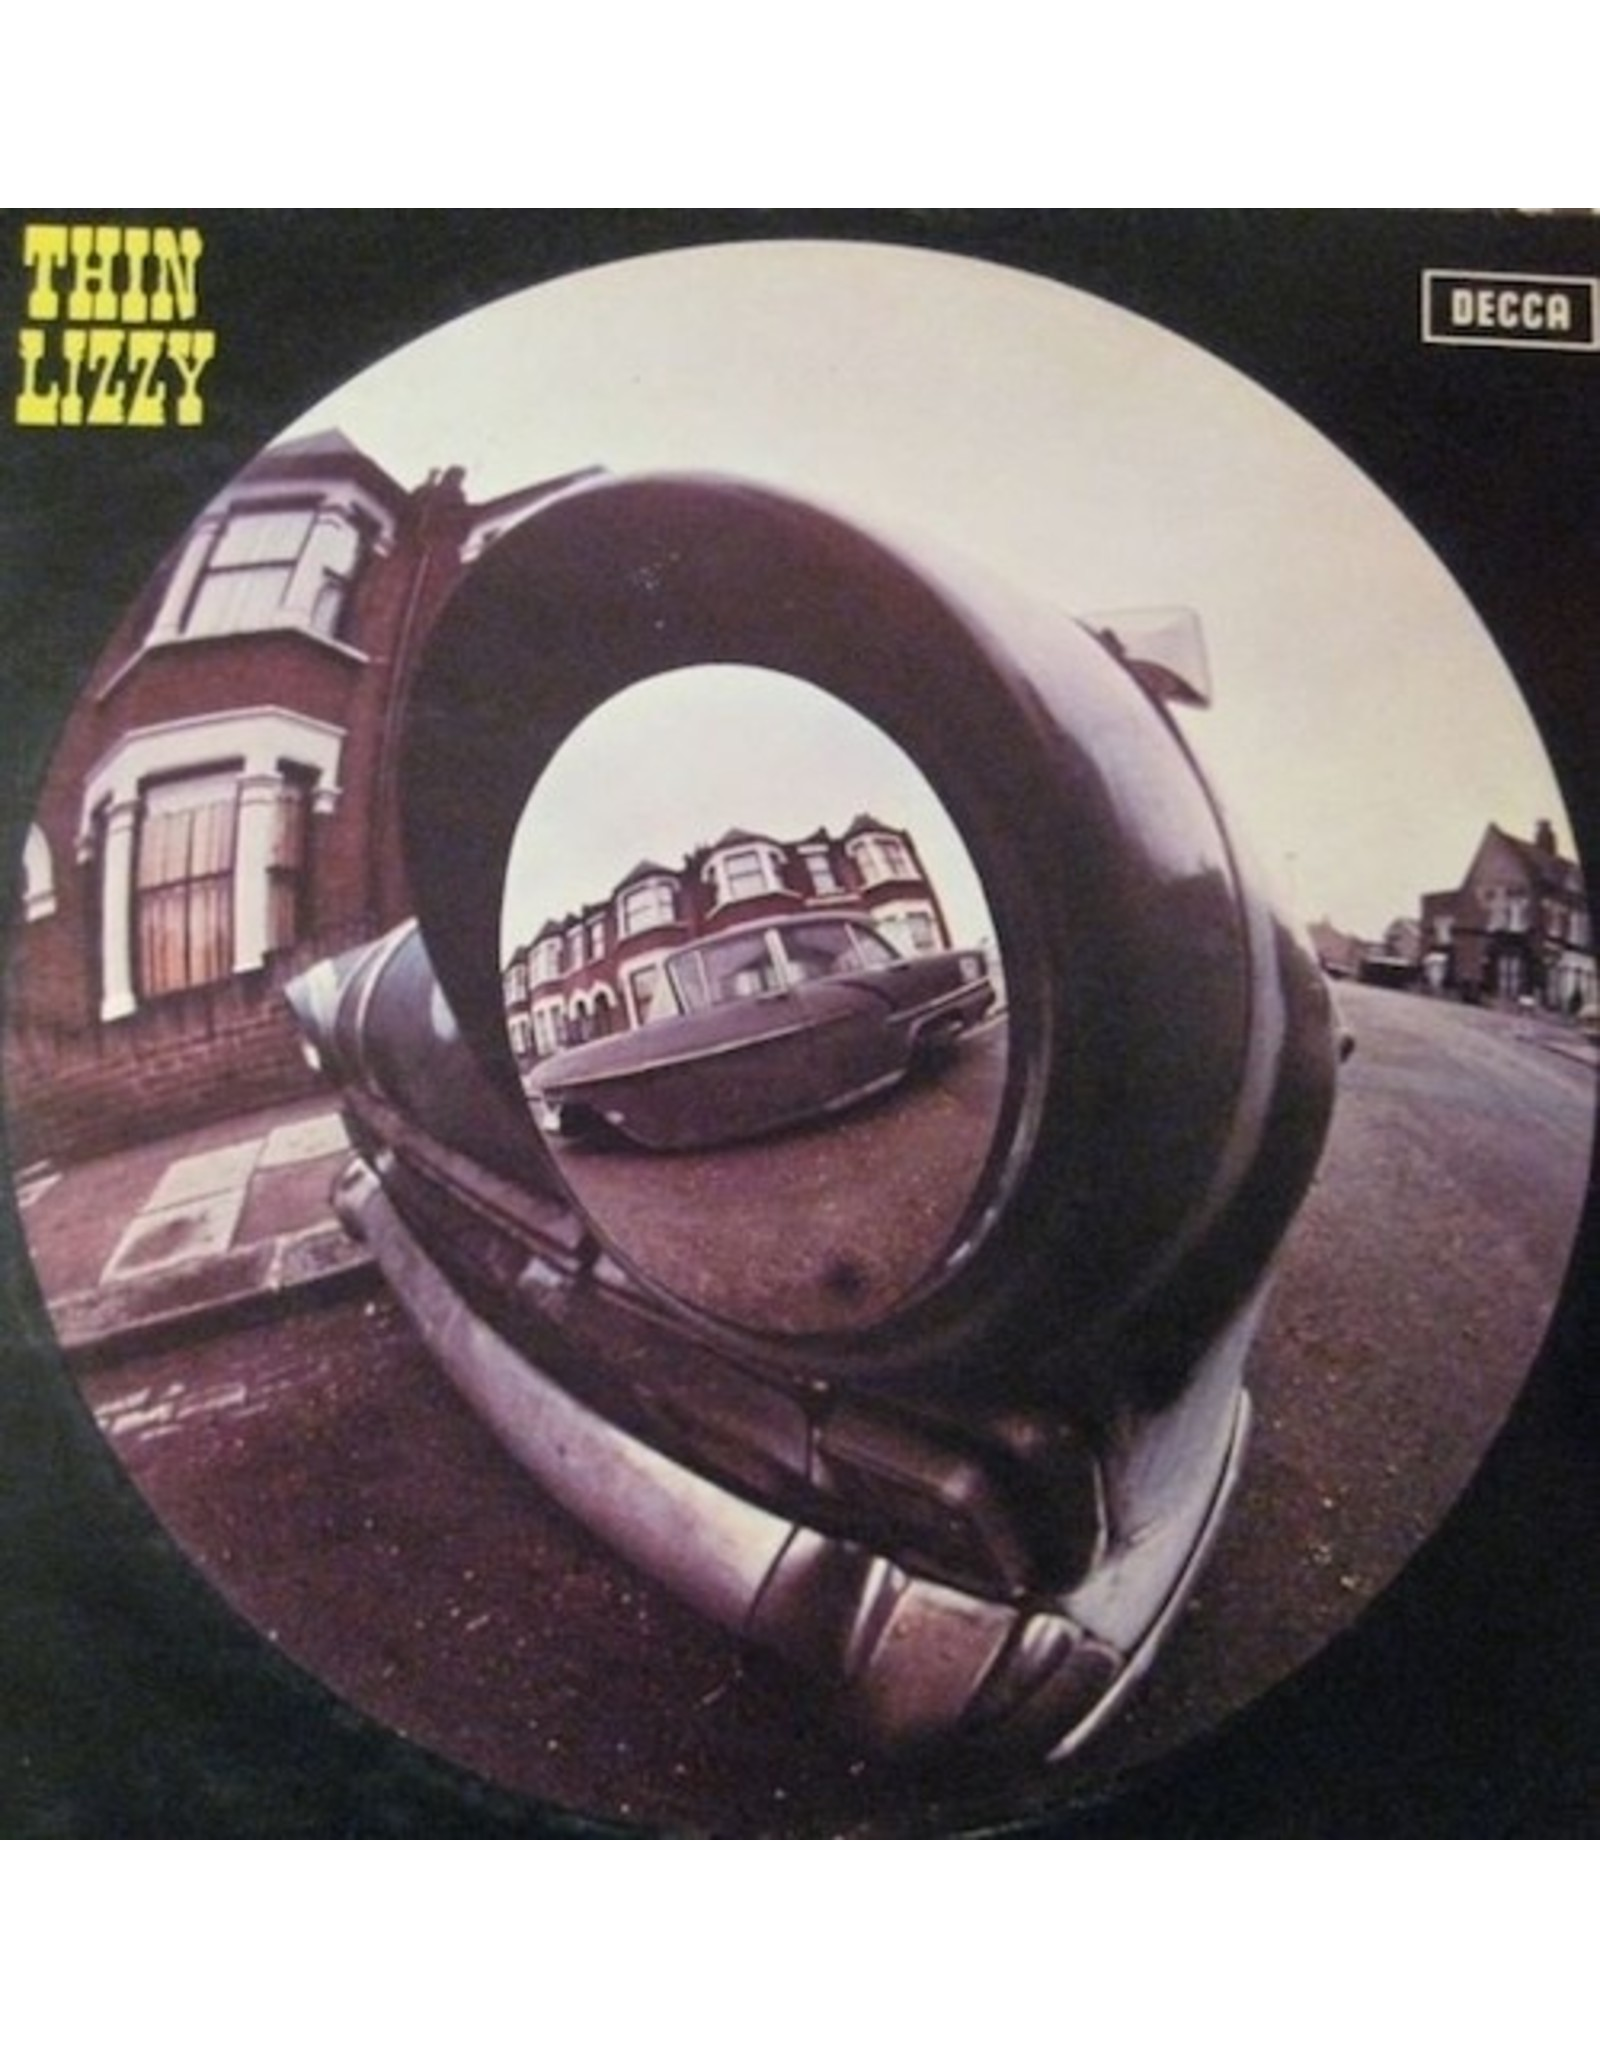 New Vinyl Thin Lizzy - Thin Lizzy [UK Import] LP